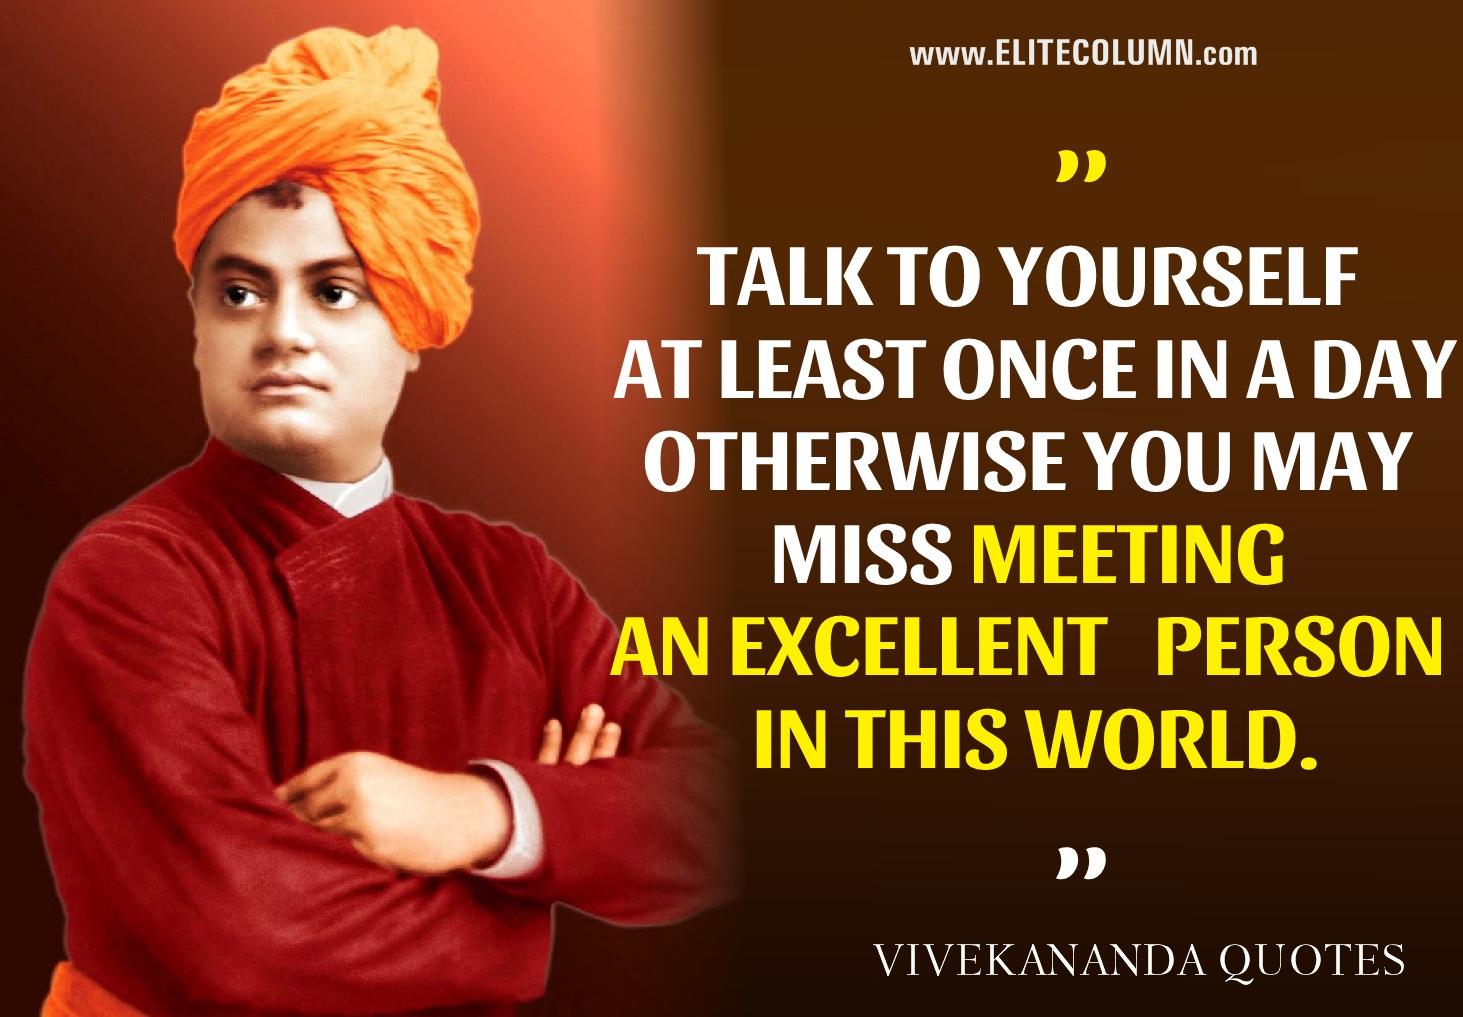 Vivekananda Quotes (9)